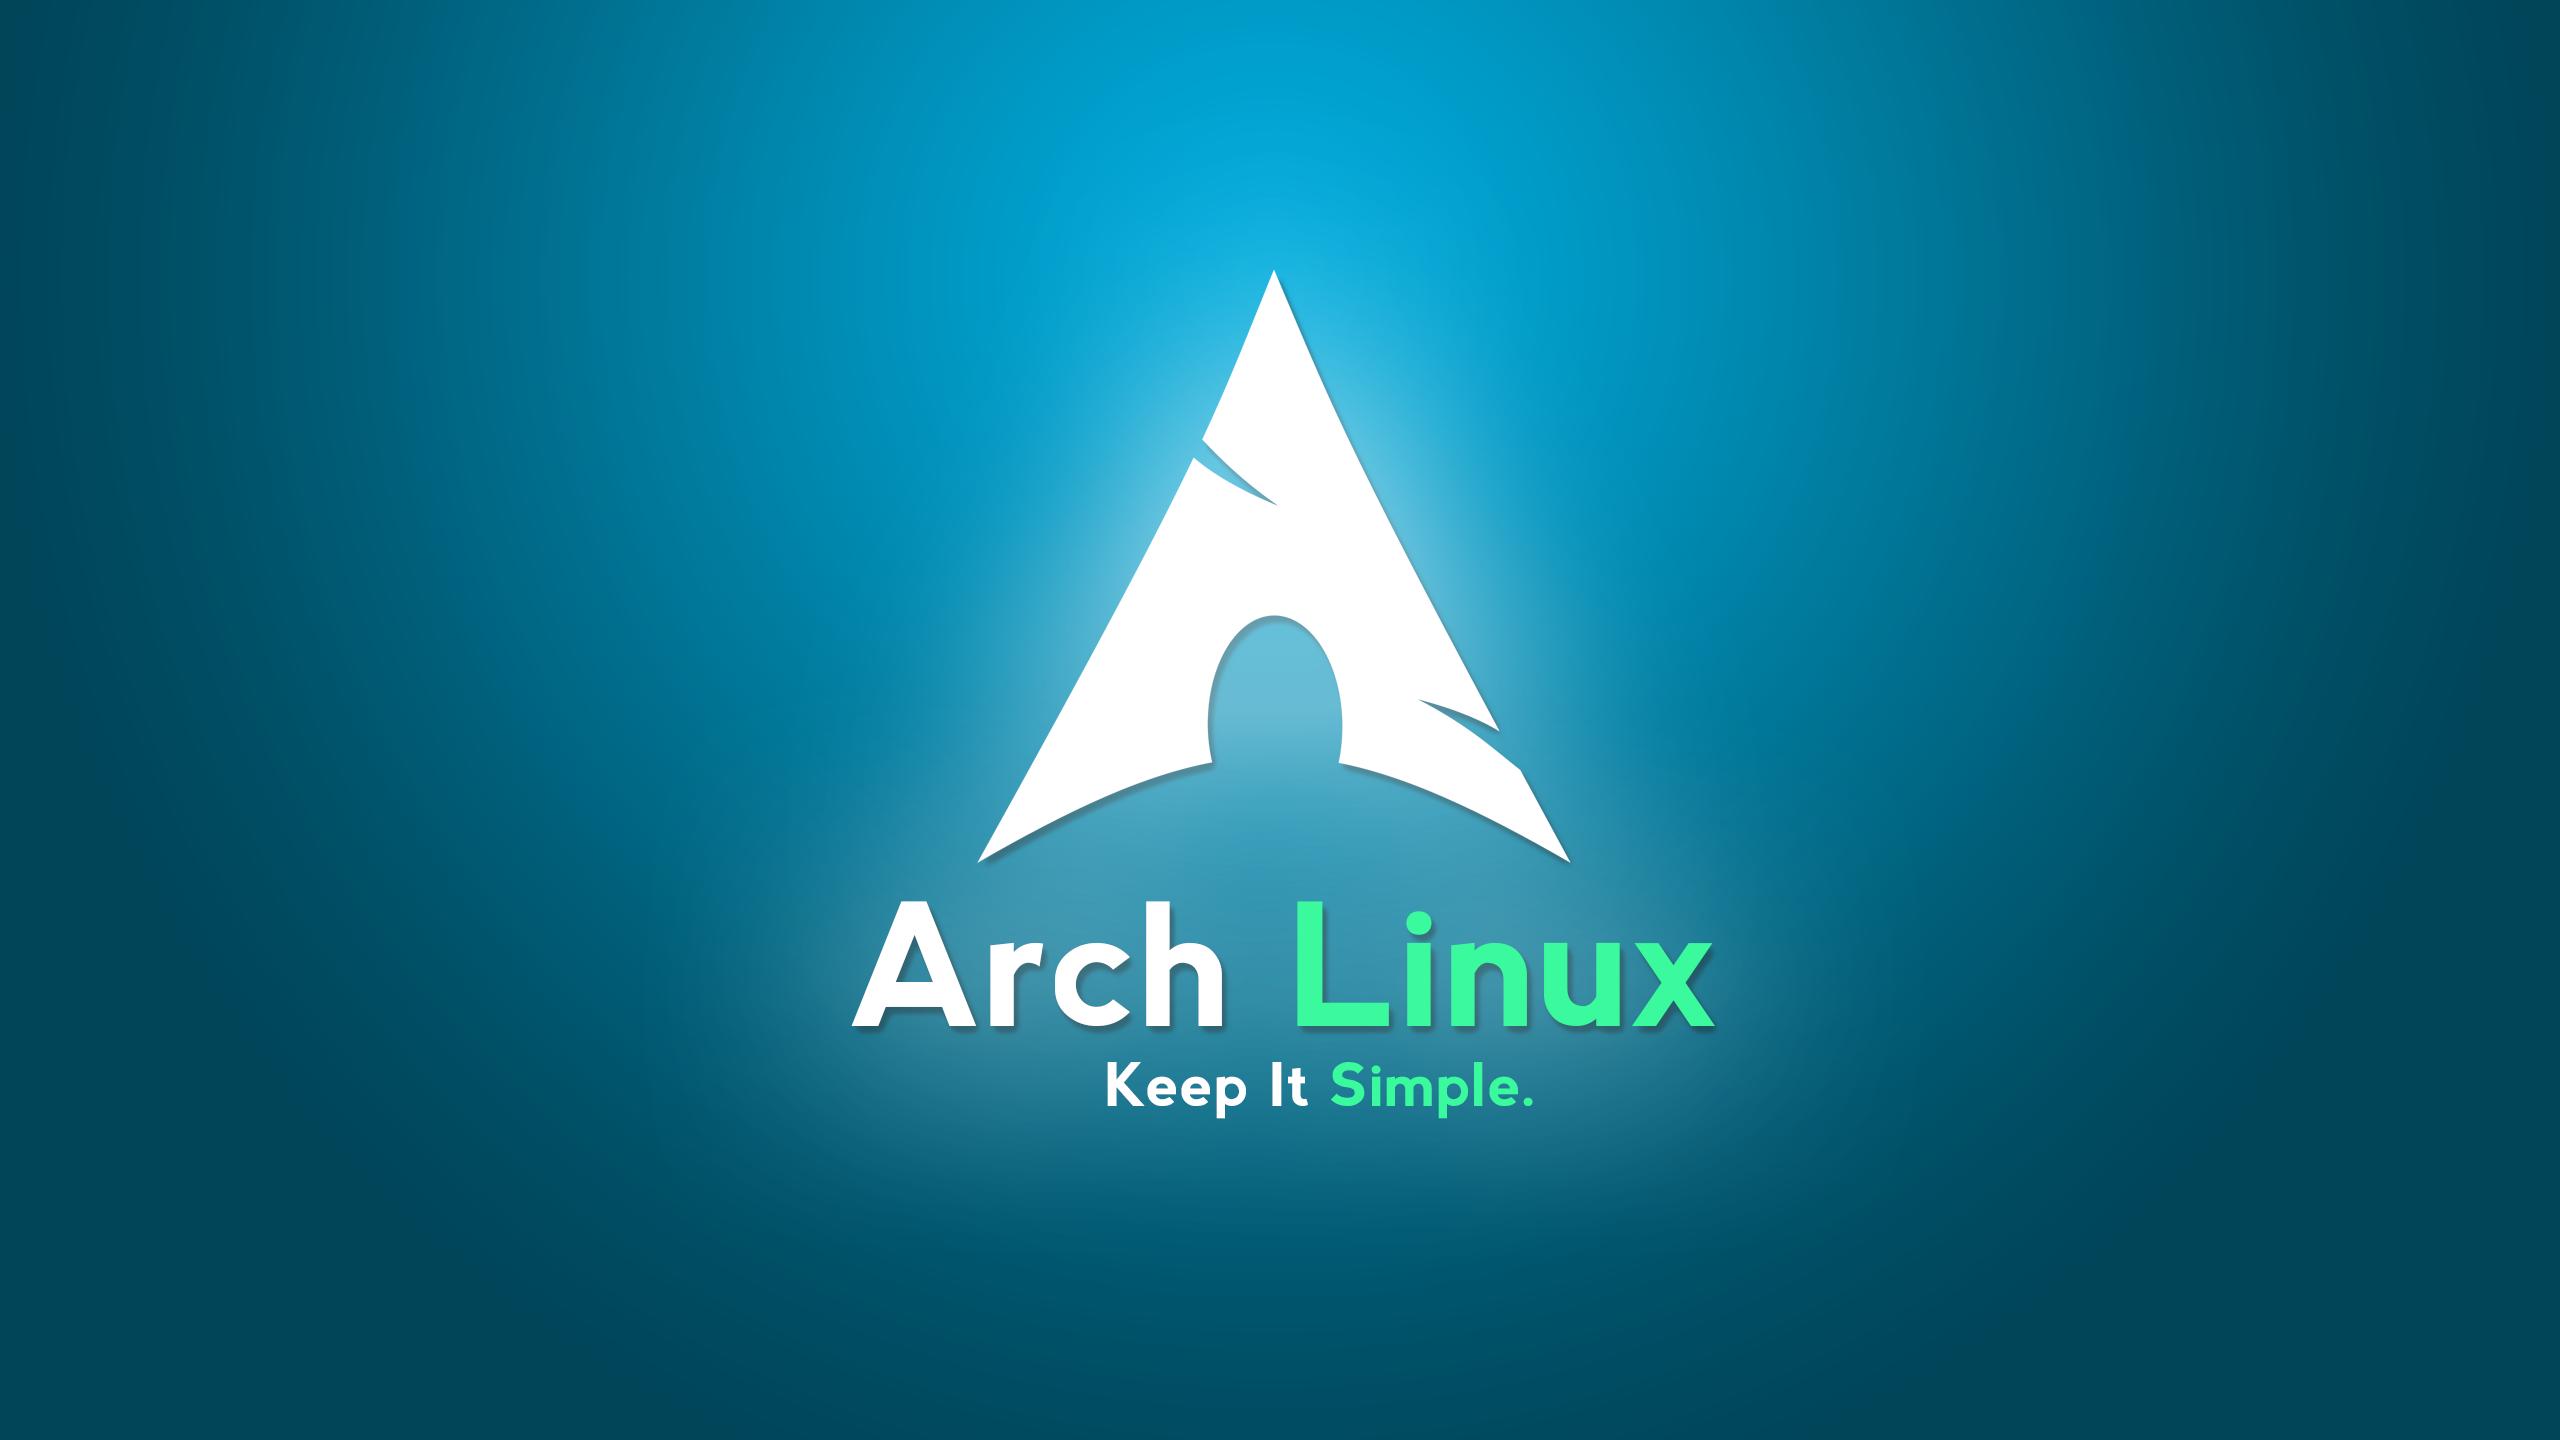 arch linux wallpaper black - photo #31